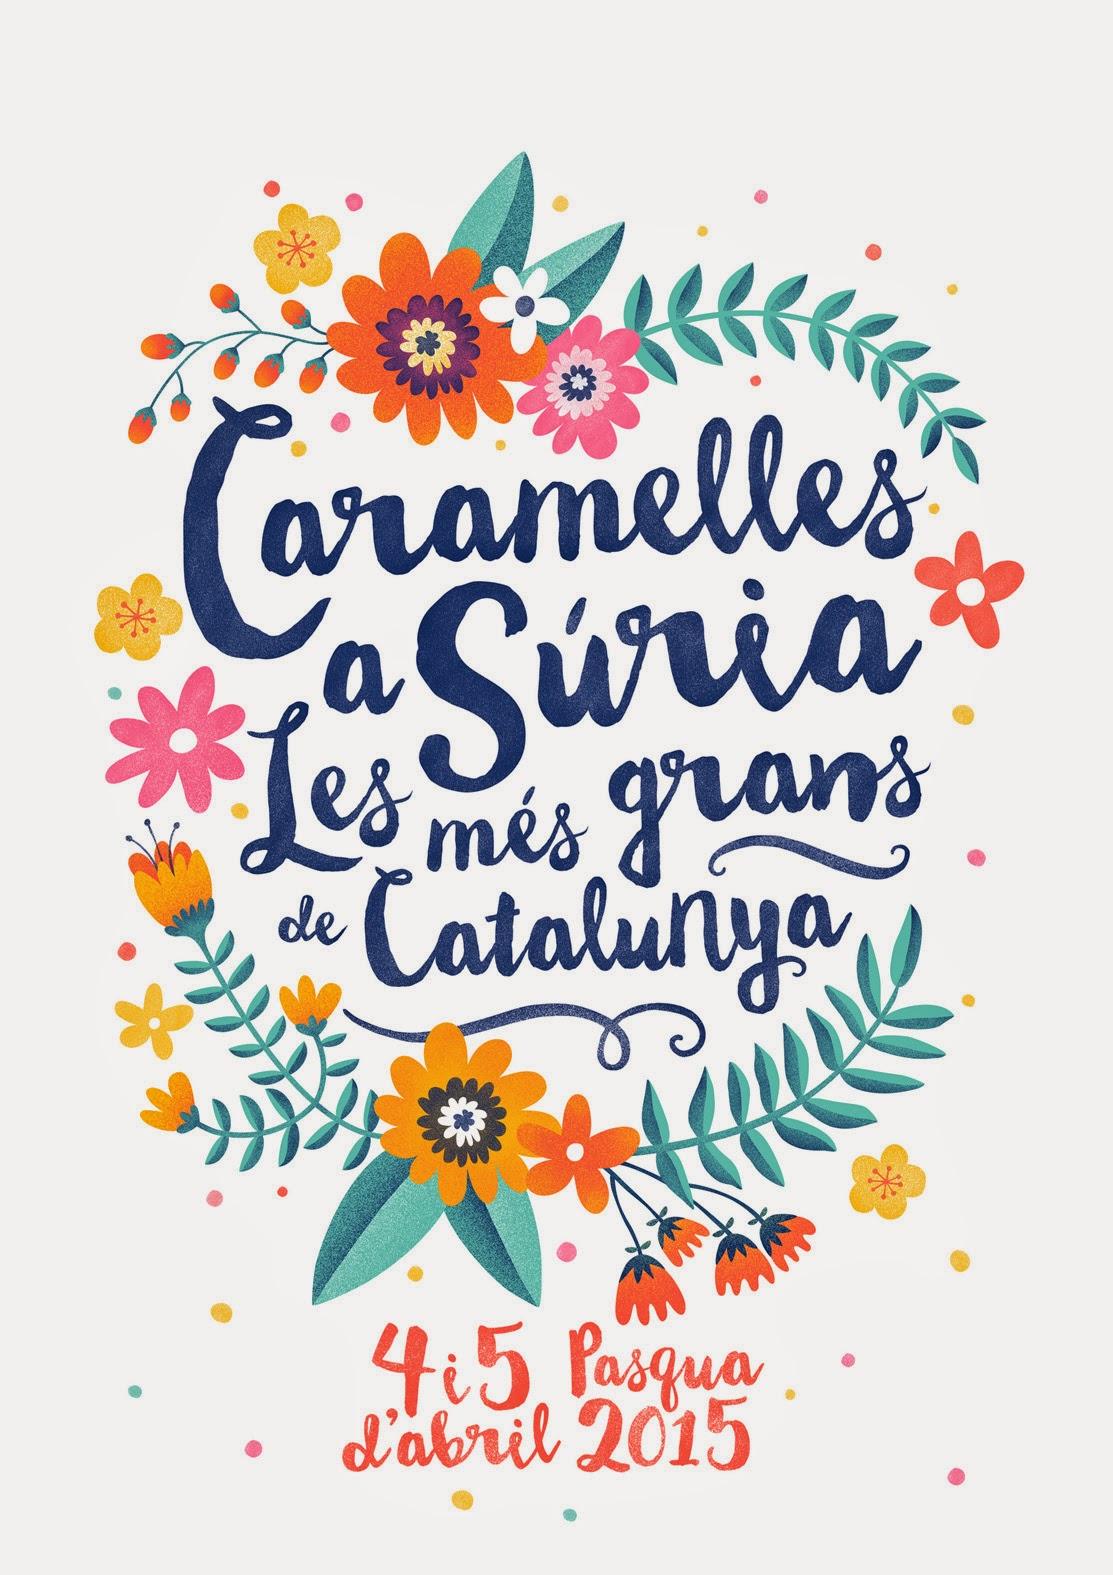 http://es.slideshare.net/Berta87/caramelles-2015-repertori